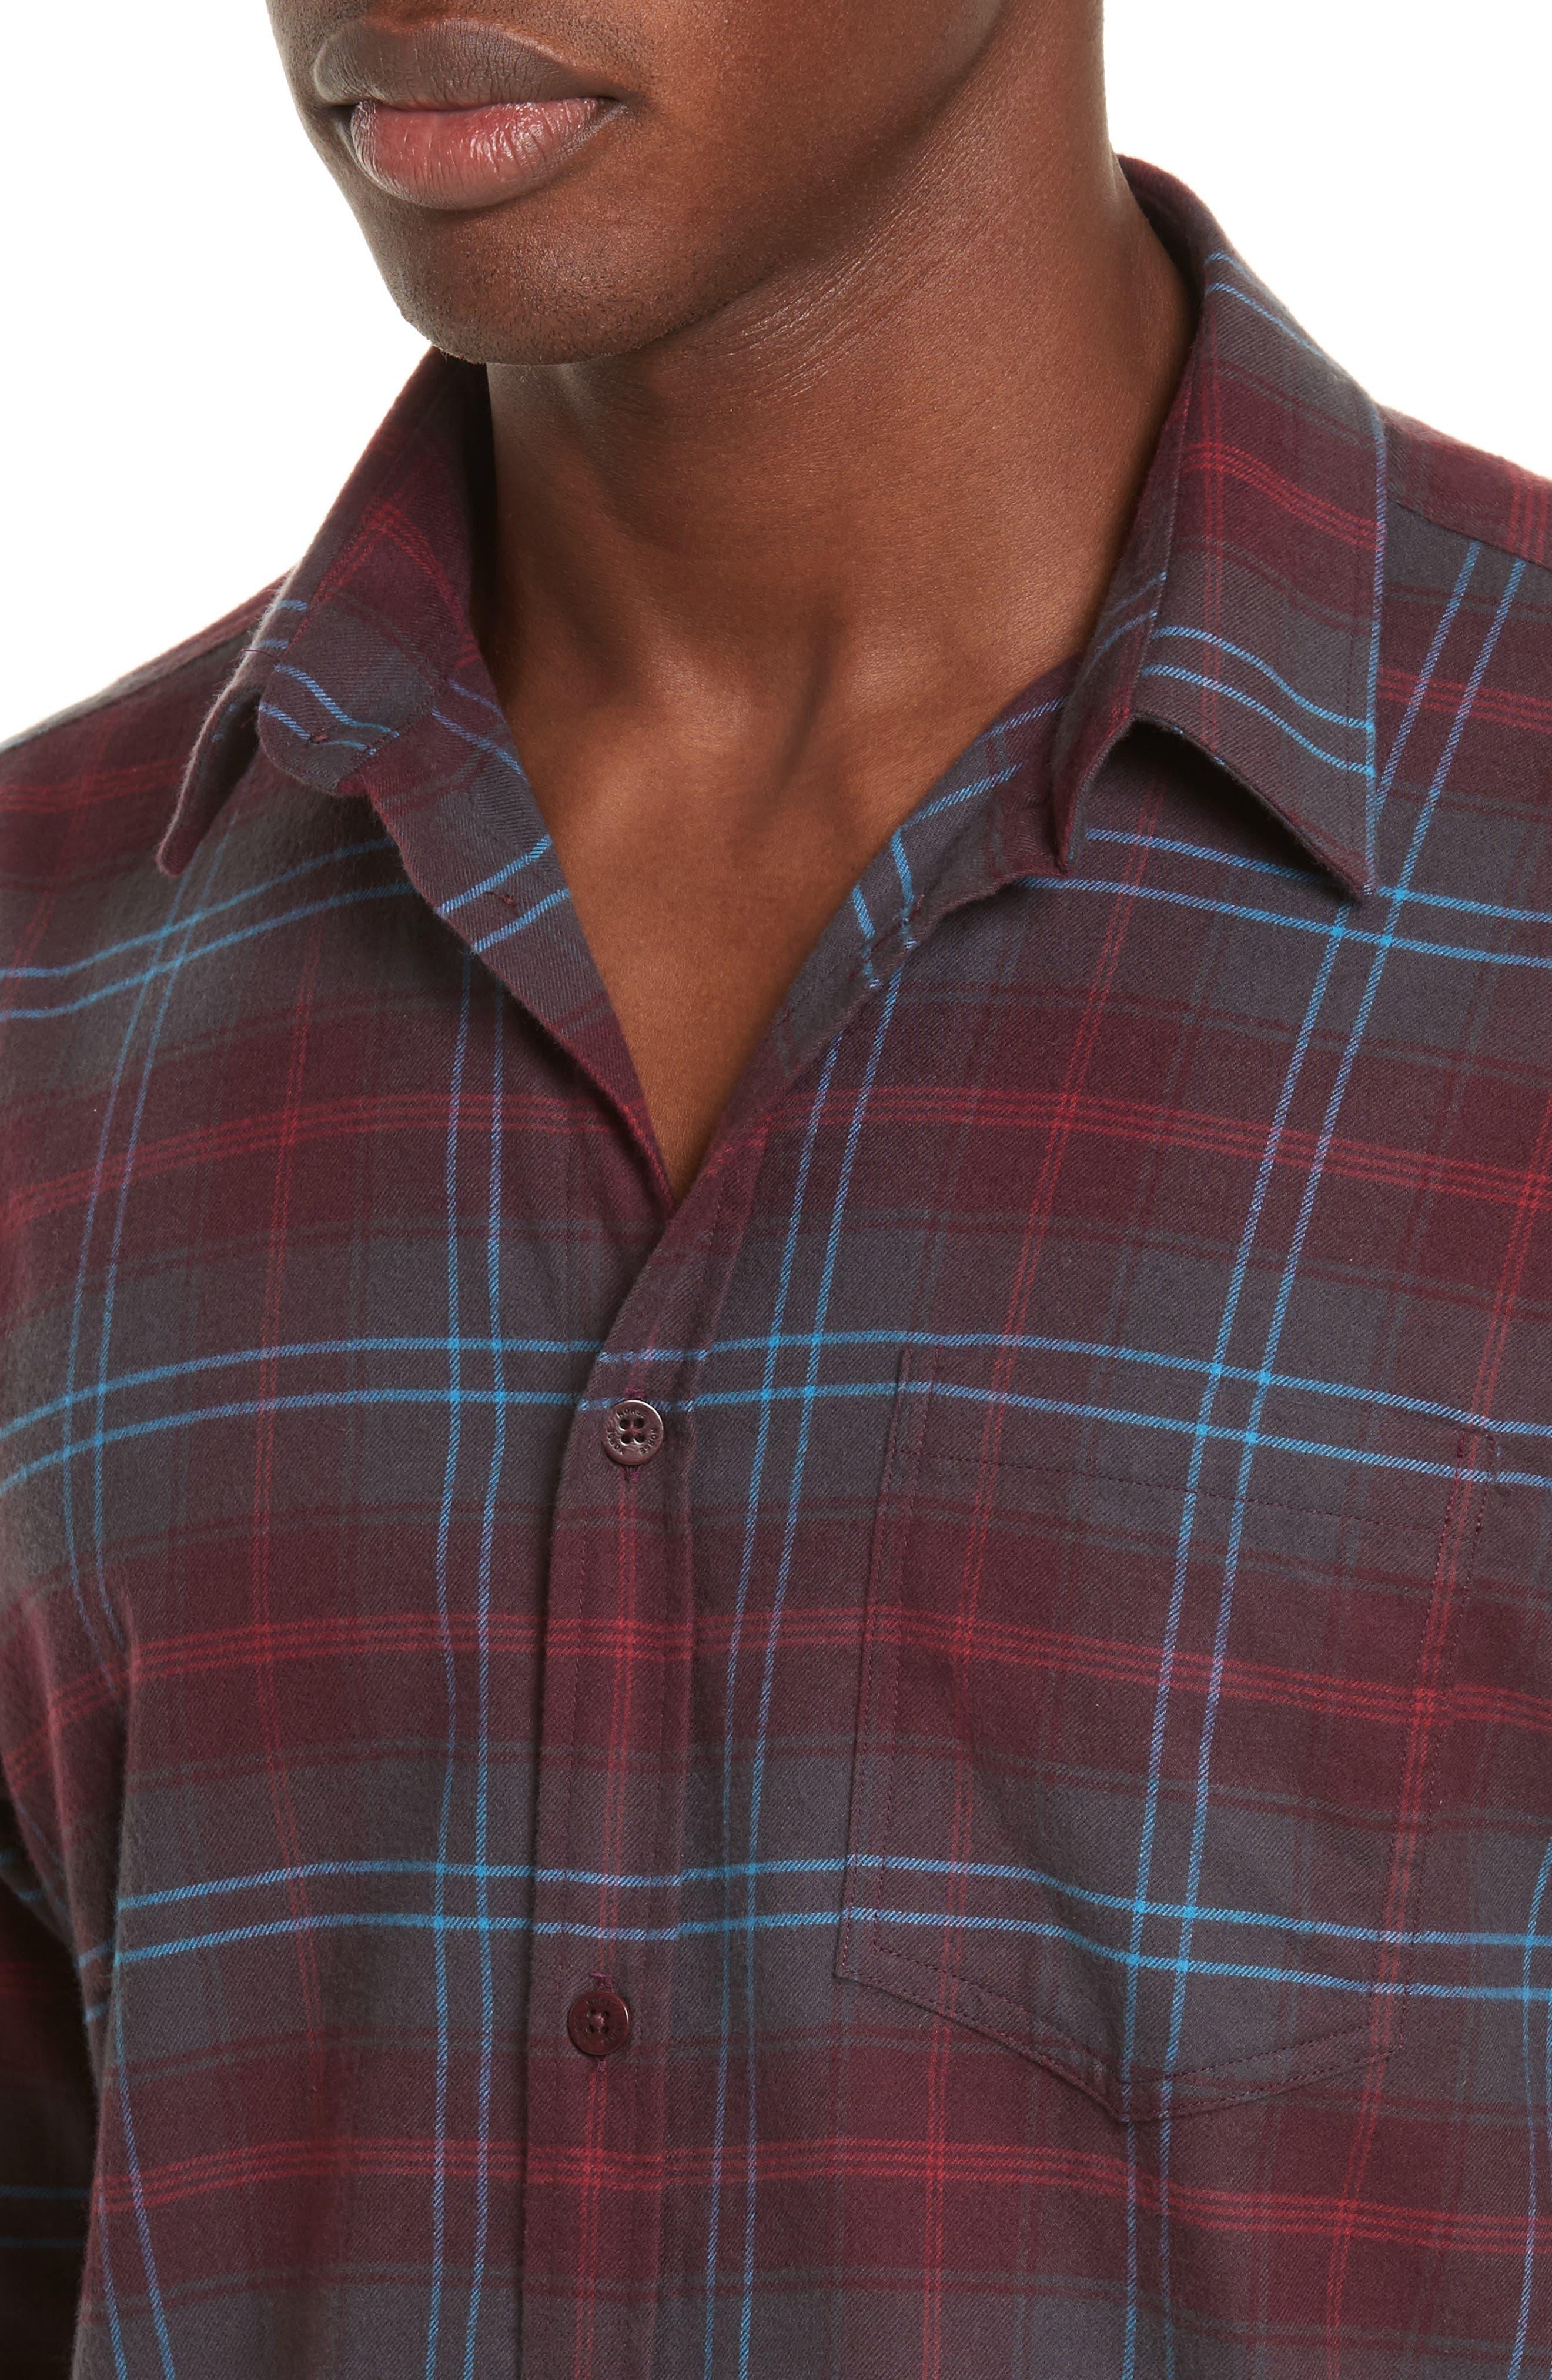 Hans Brushed Check Shirt,                             Alternate thumbnail 5, color,                             616